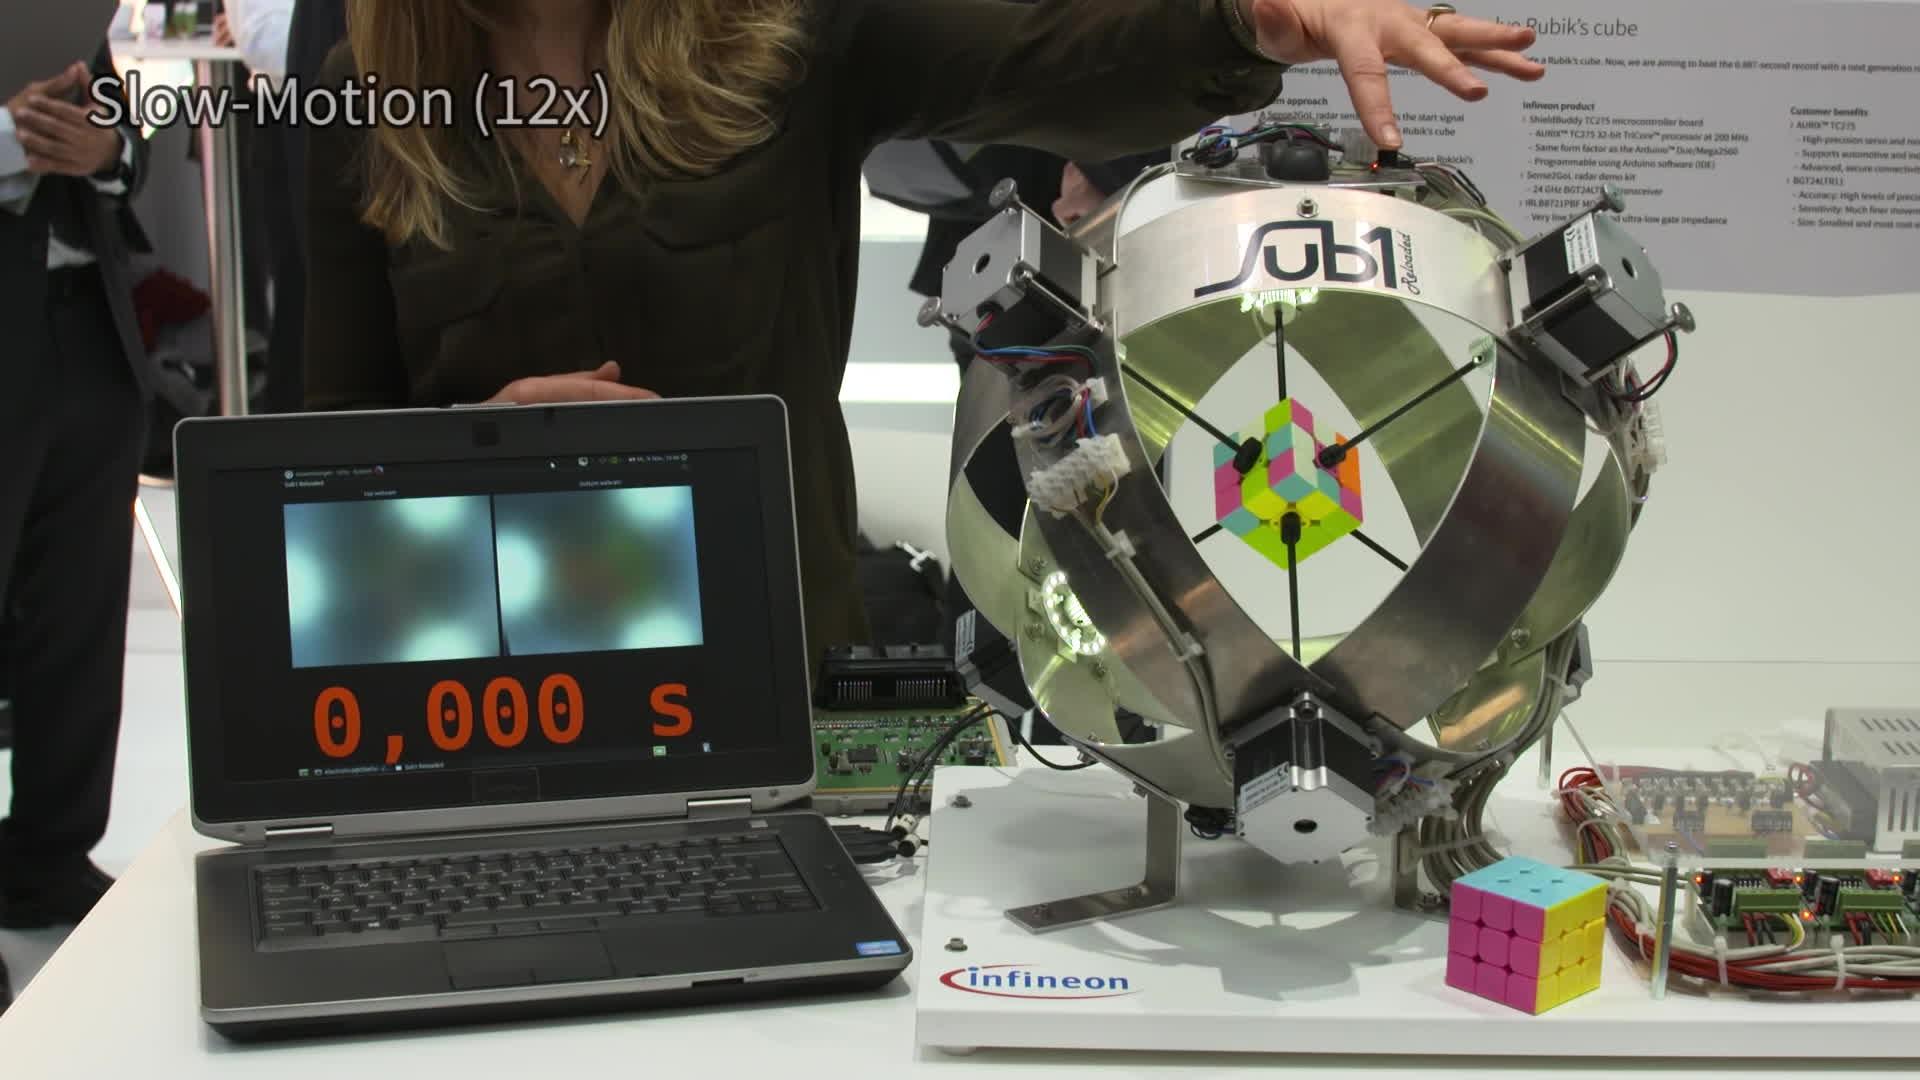 Cubers, mechanical_gifs, rubik's cube, 0.637 seconds - a new Rubik's Cube machine world record! GIFs